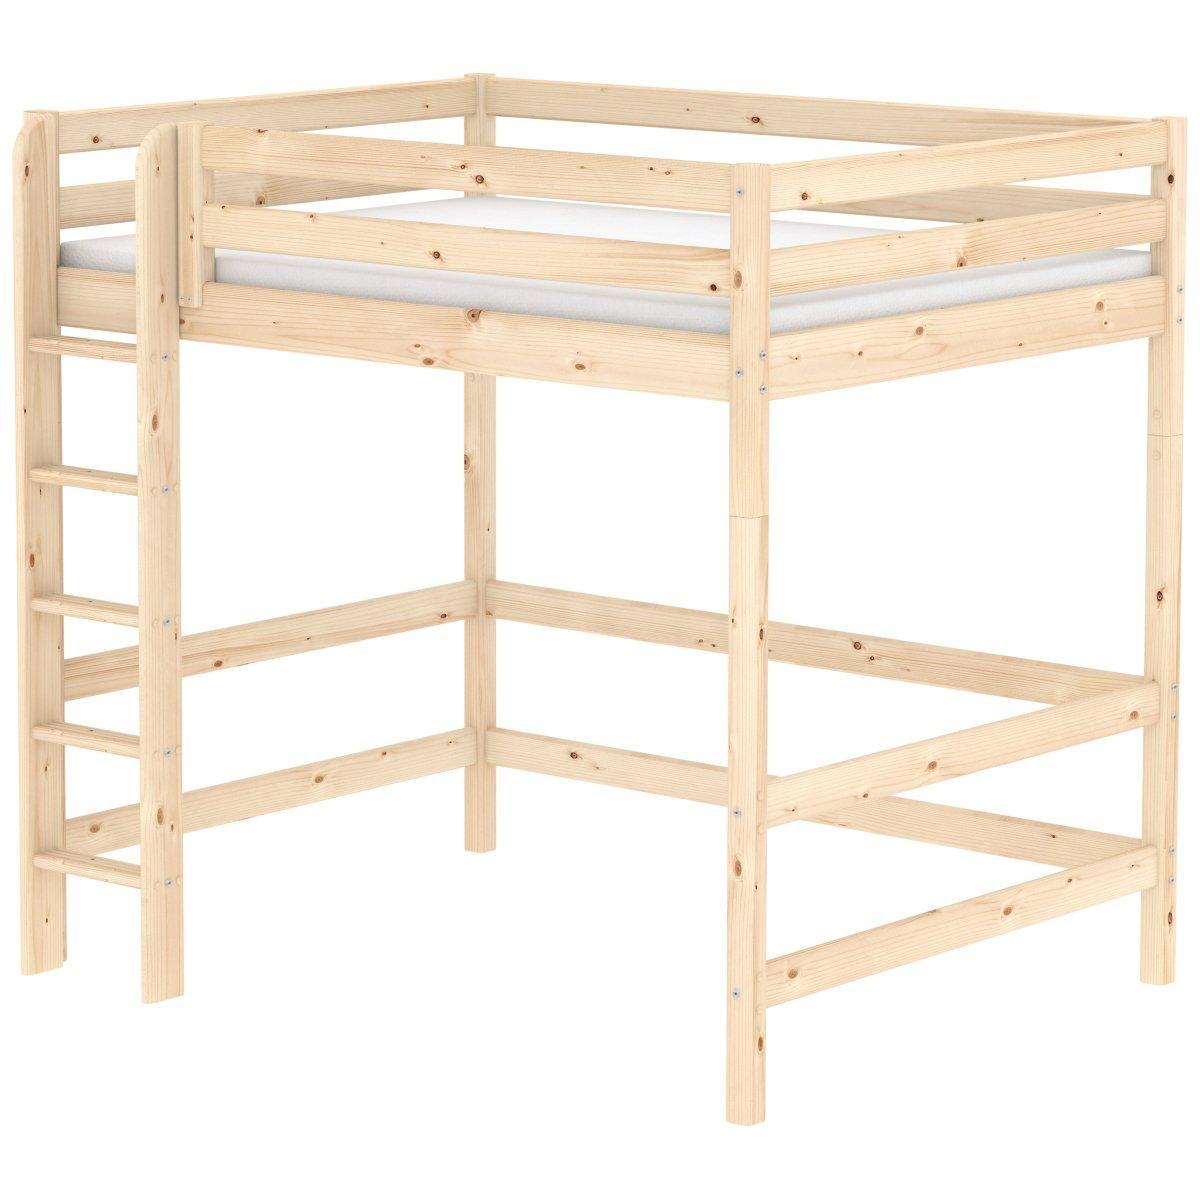 flexa classic hochbett in natur 90 10621 1 01 774. Black Bedroom Furniture Sets. Home Design Ideas